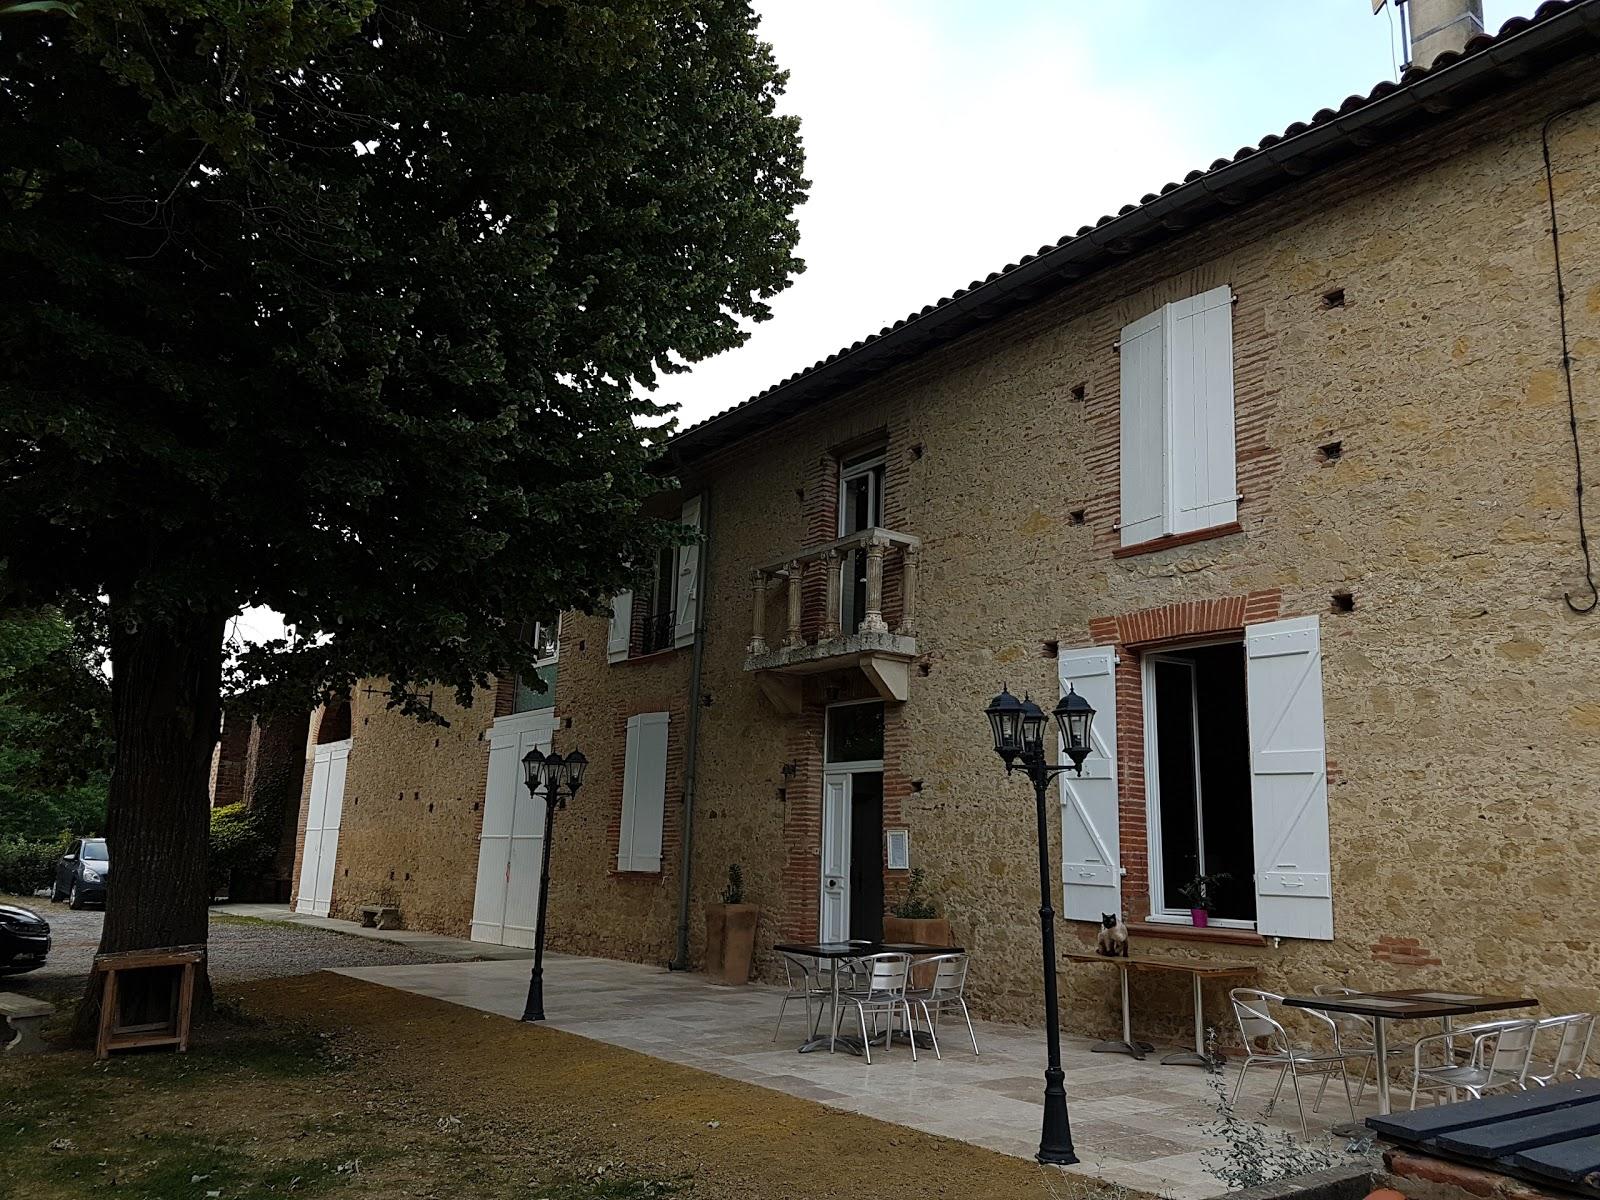 Rental Apartment Thiers Saint Jean de Luz 1 bedroom 3 persons